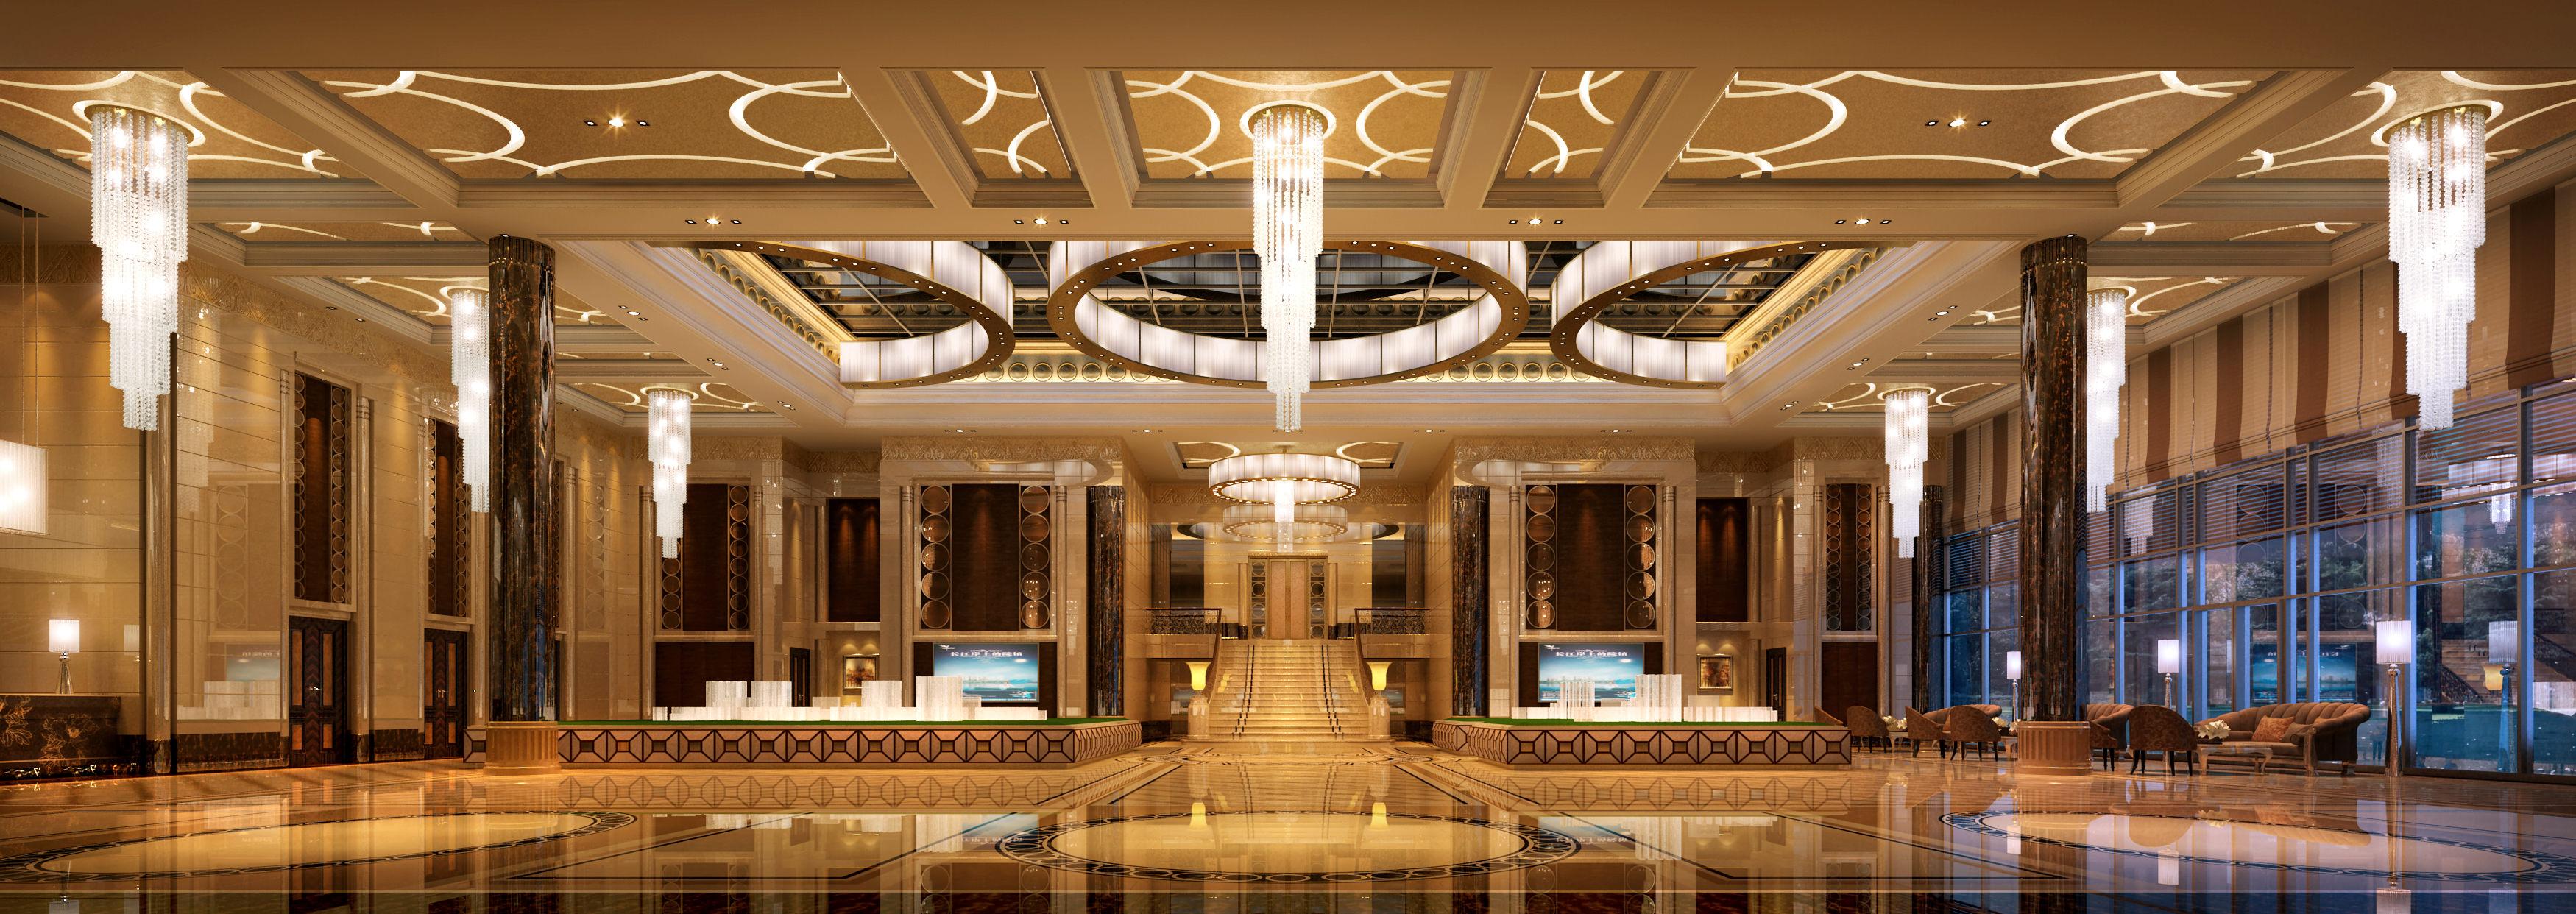 3d rendering luxury hotel lobby china luxury china hotel lobby - Huge Lobby 3d Model Max 1